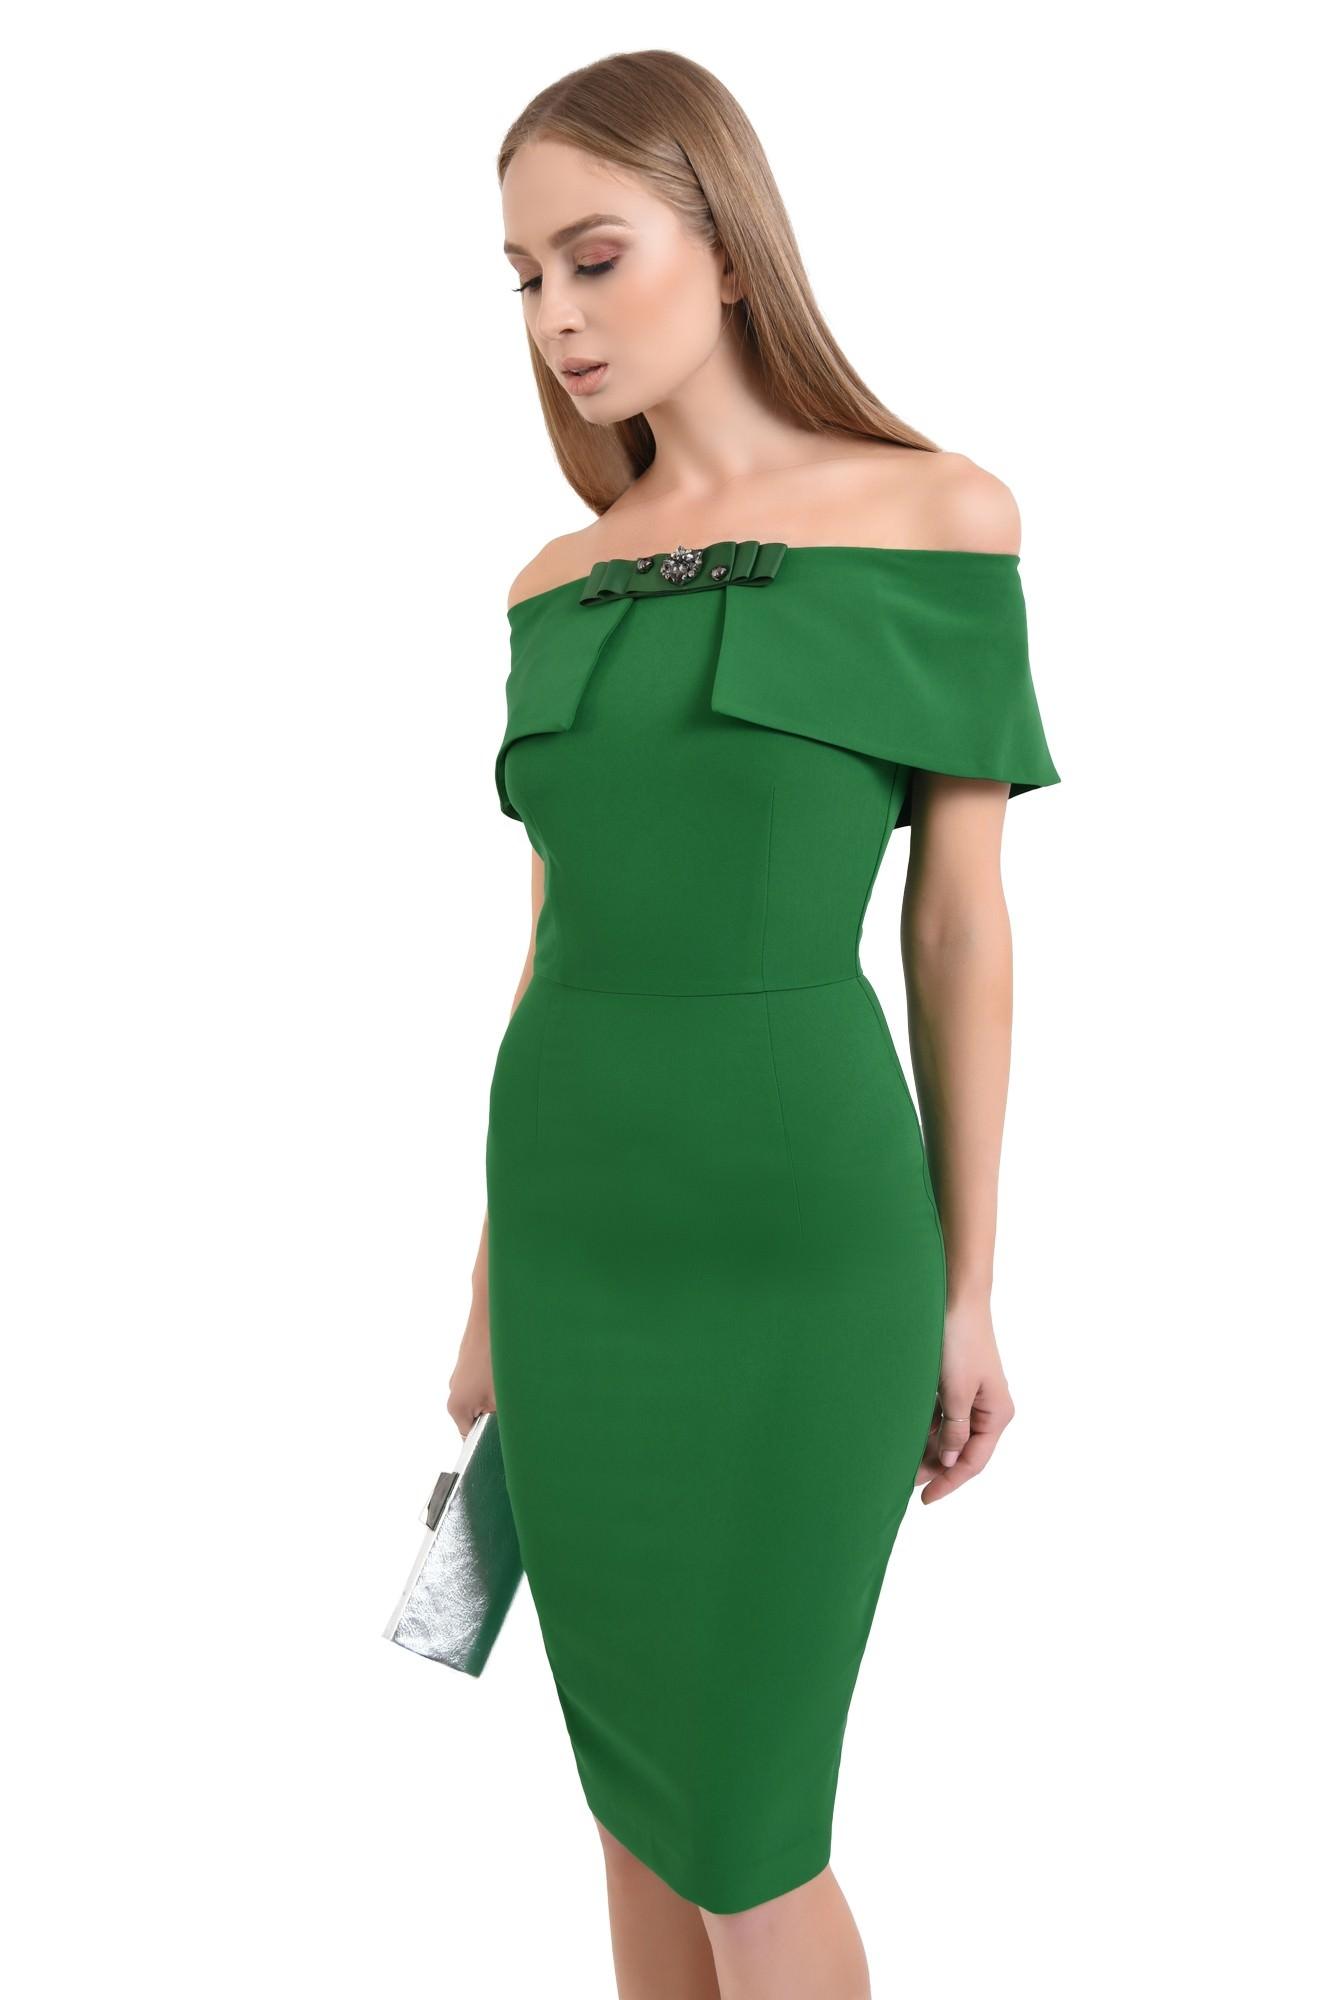 0 - rochie eleganta, conica, funda, brosa